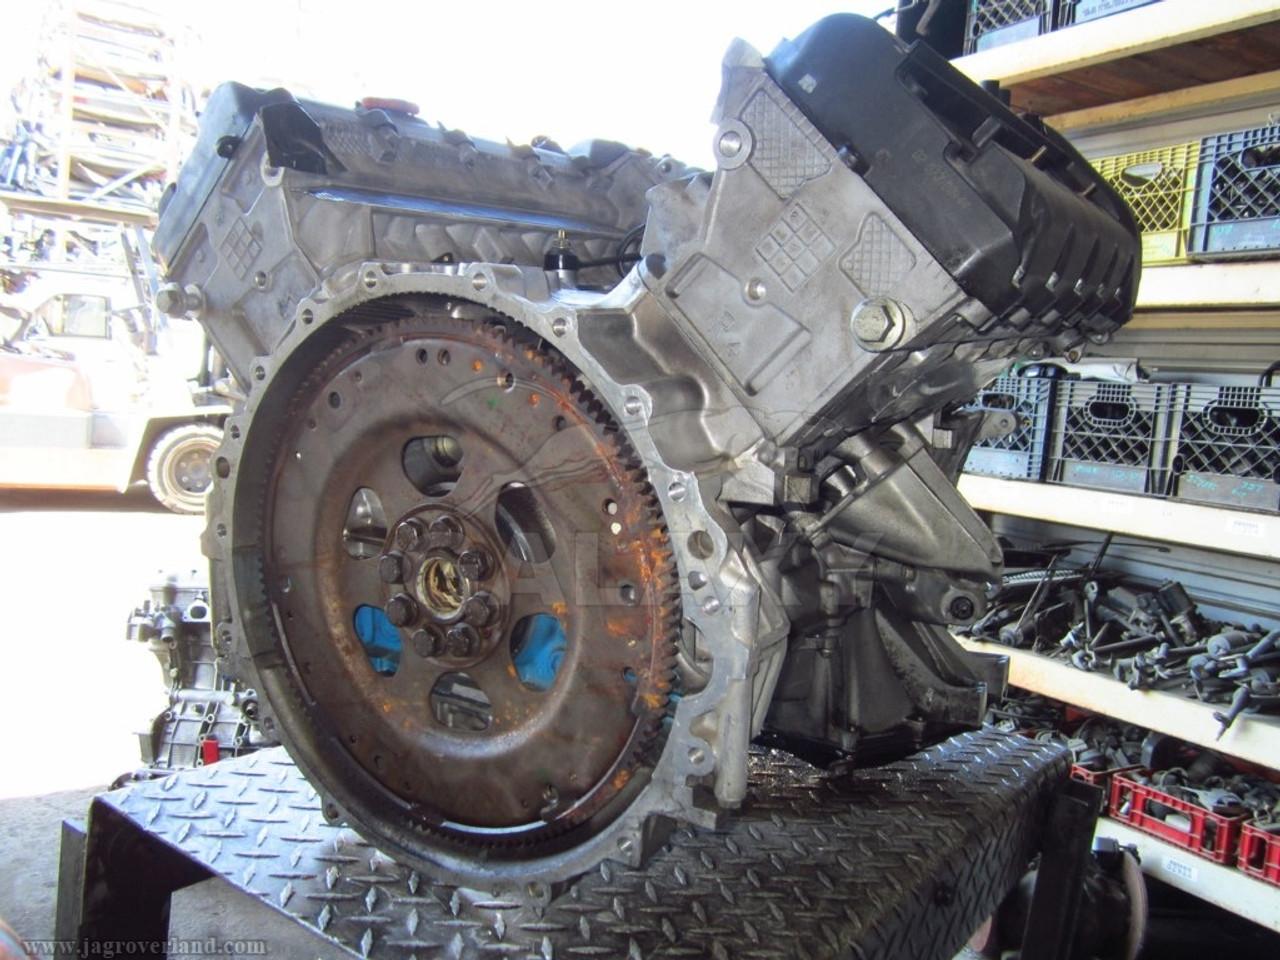 Rebuilt Jaguar Supercharged Engine 03 06 S Type Xj Xk R 4 2l 2w93 6015 Da Galaxy Jaguar